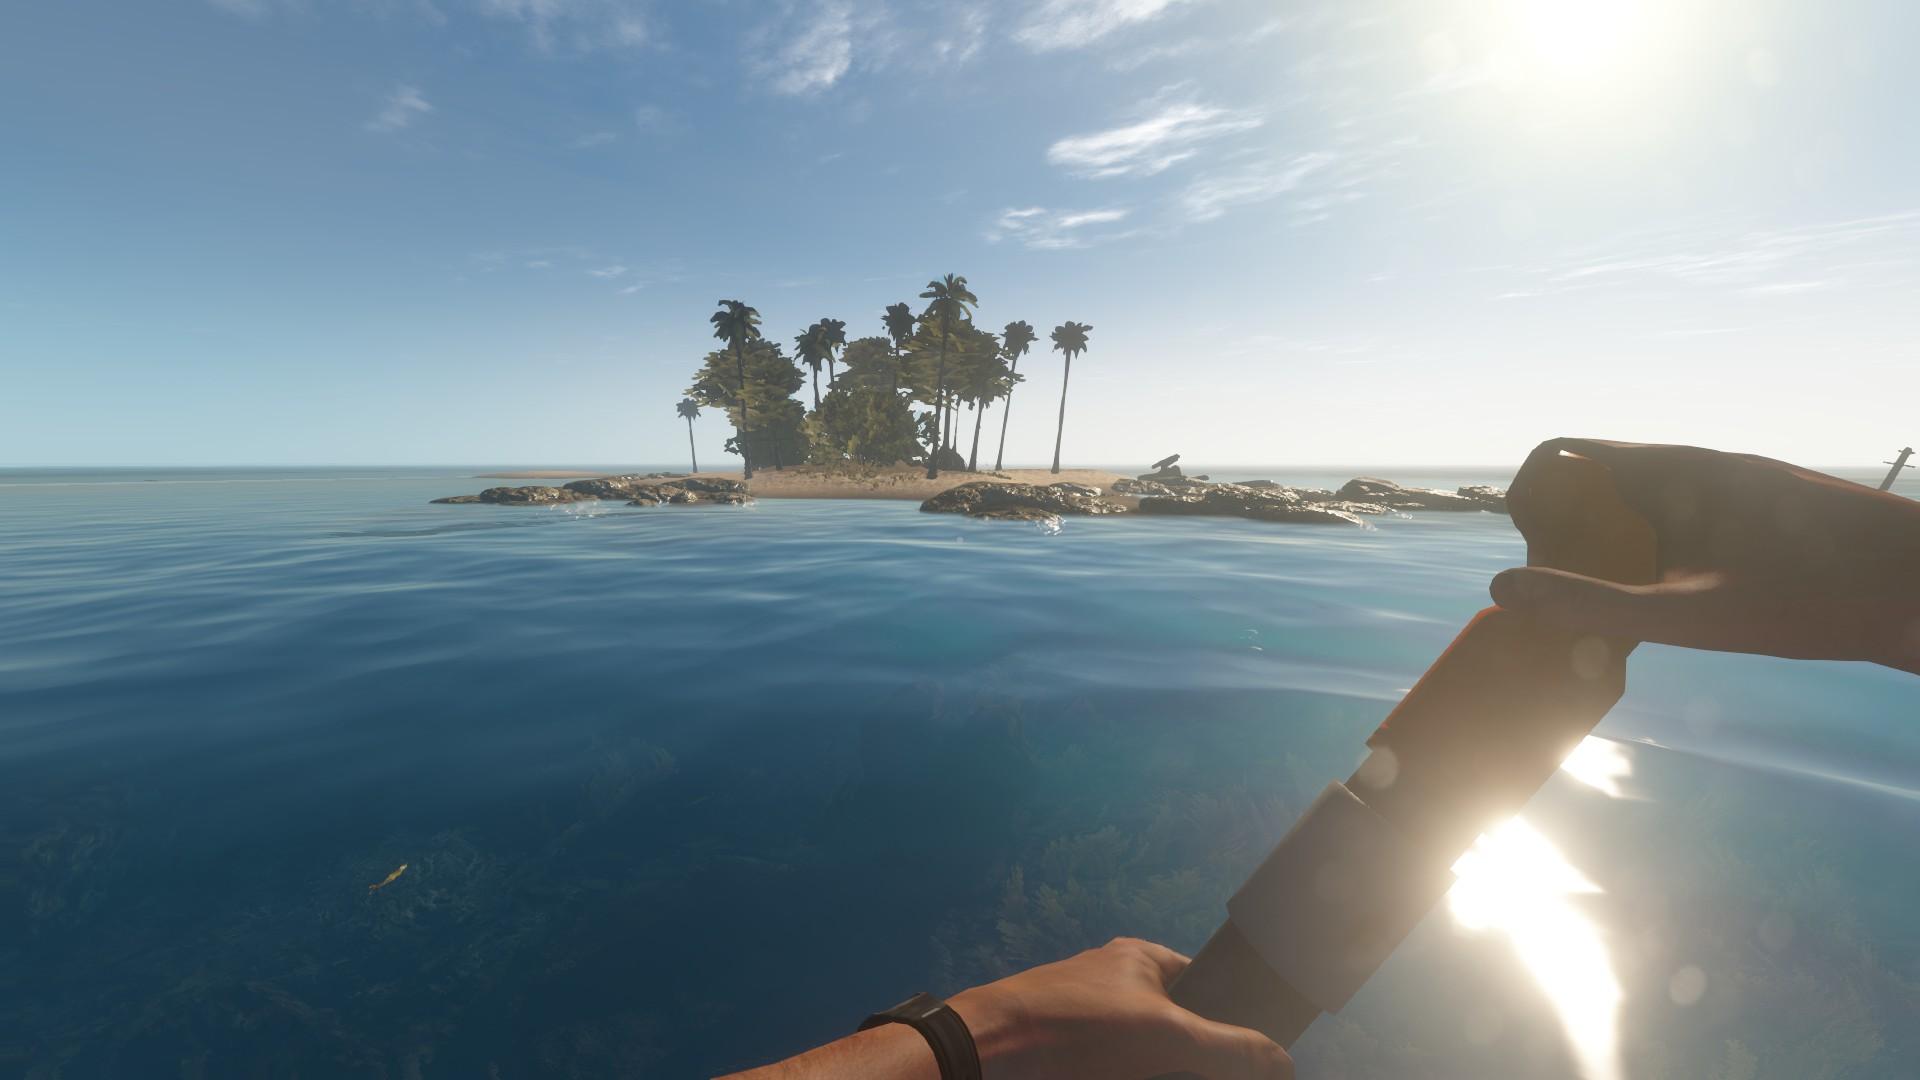 Stranded Deep - Insel in Sicht.jpg